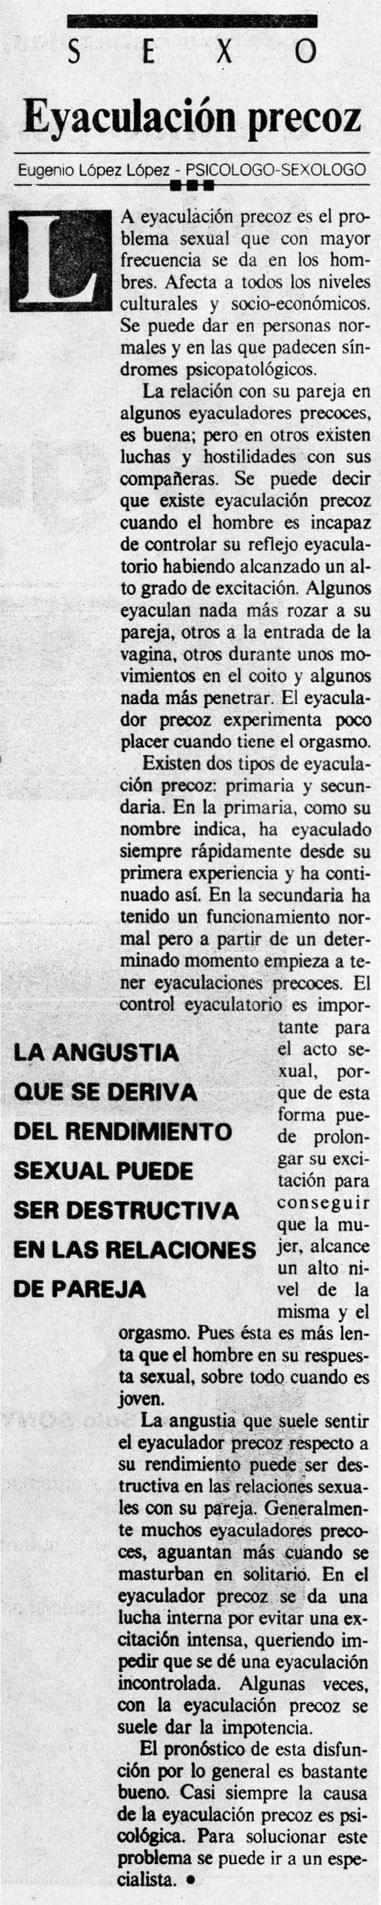 1991-04-21-p